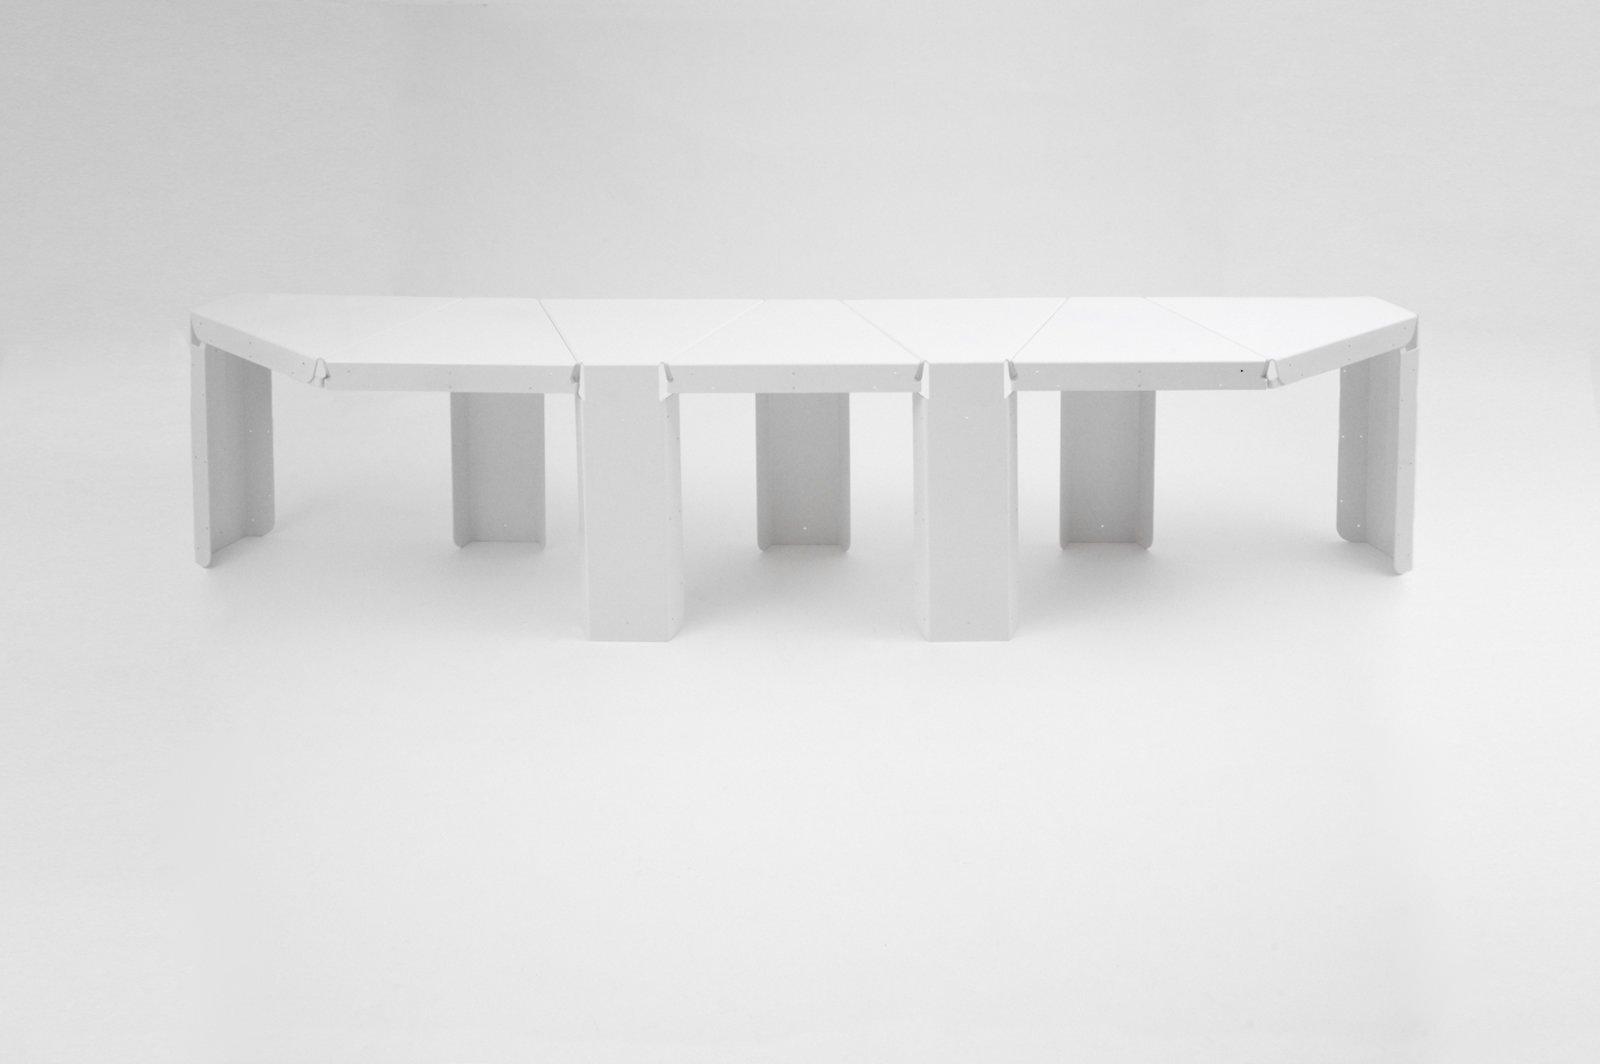 Charmant Lerivalu0027s Architect Designed Furniture